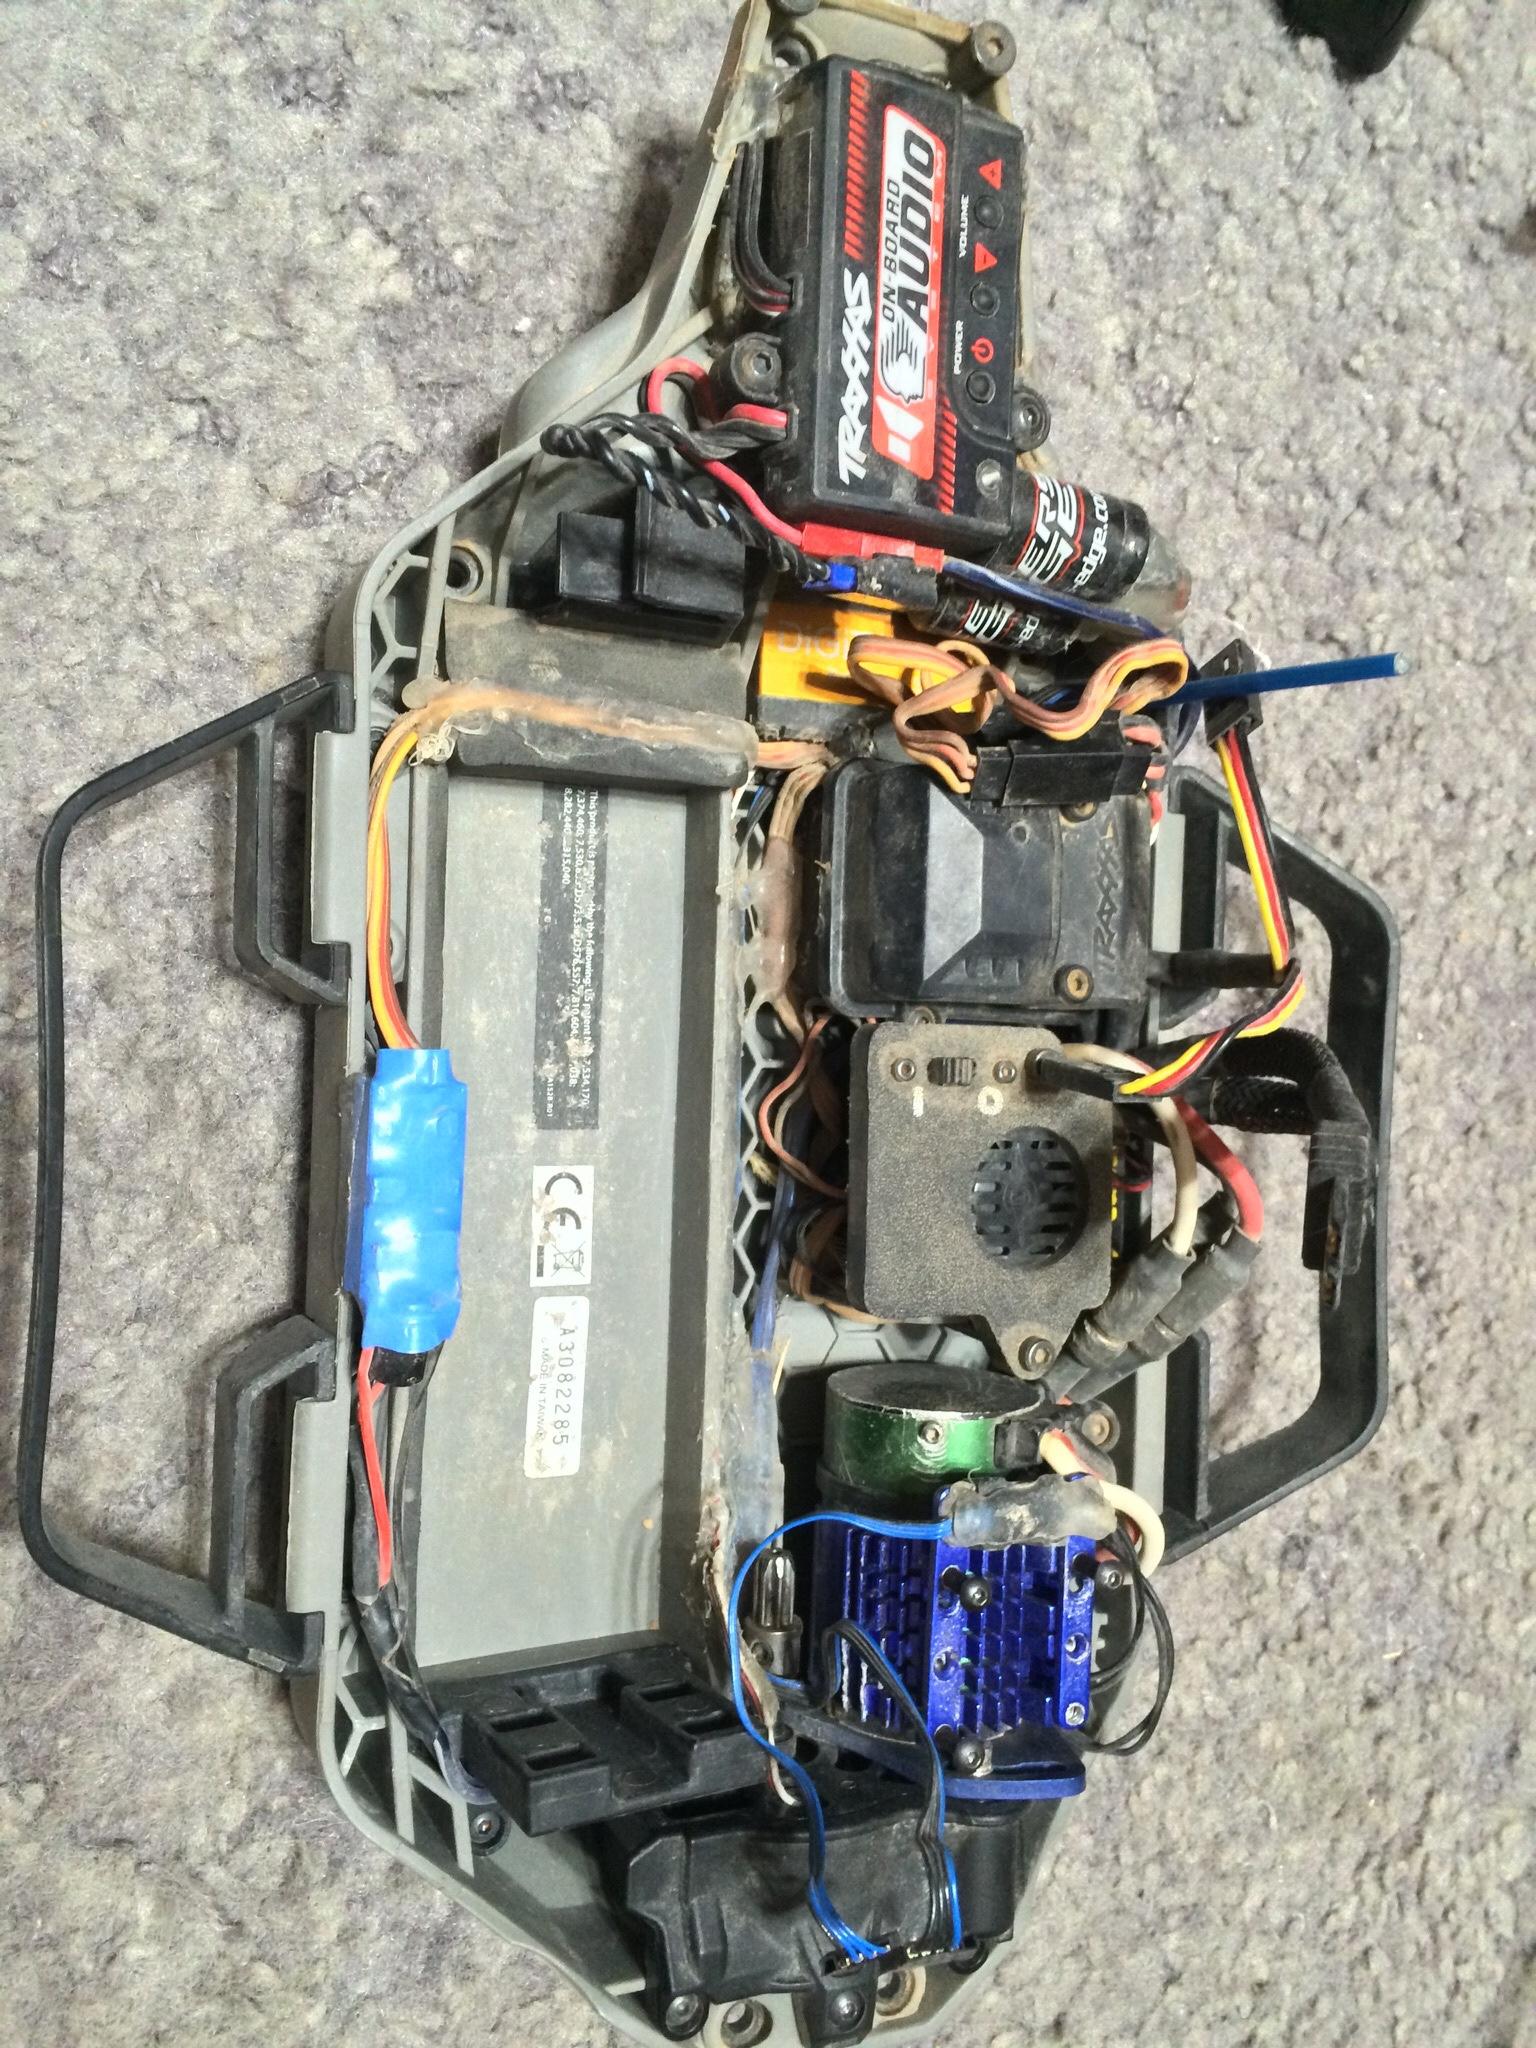 My new setup with the Mamba X & 3800kv sensored motor